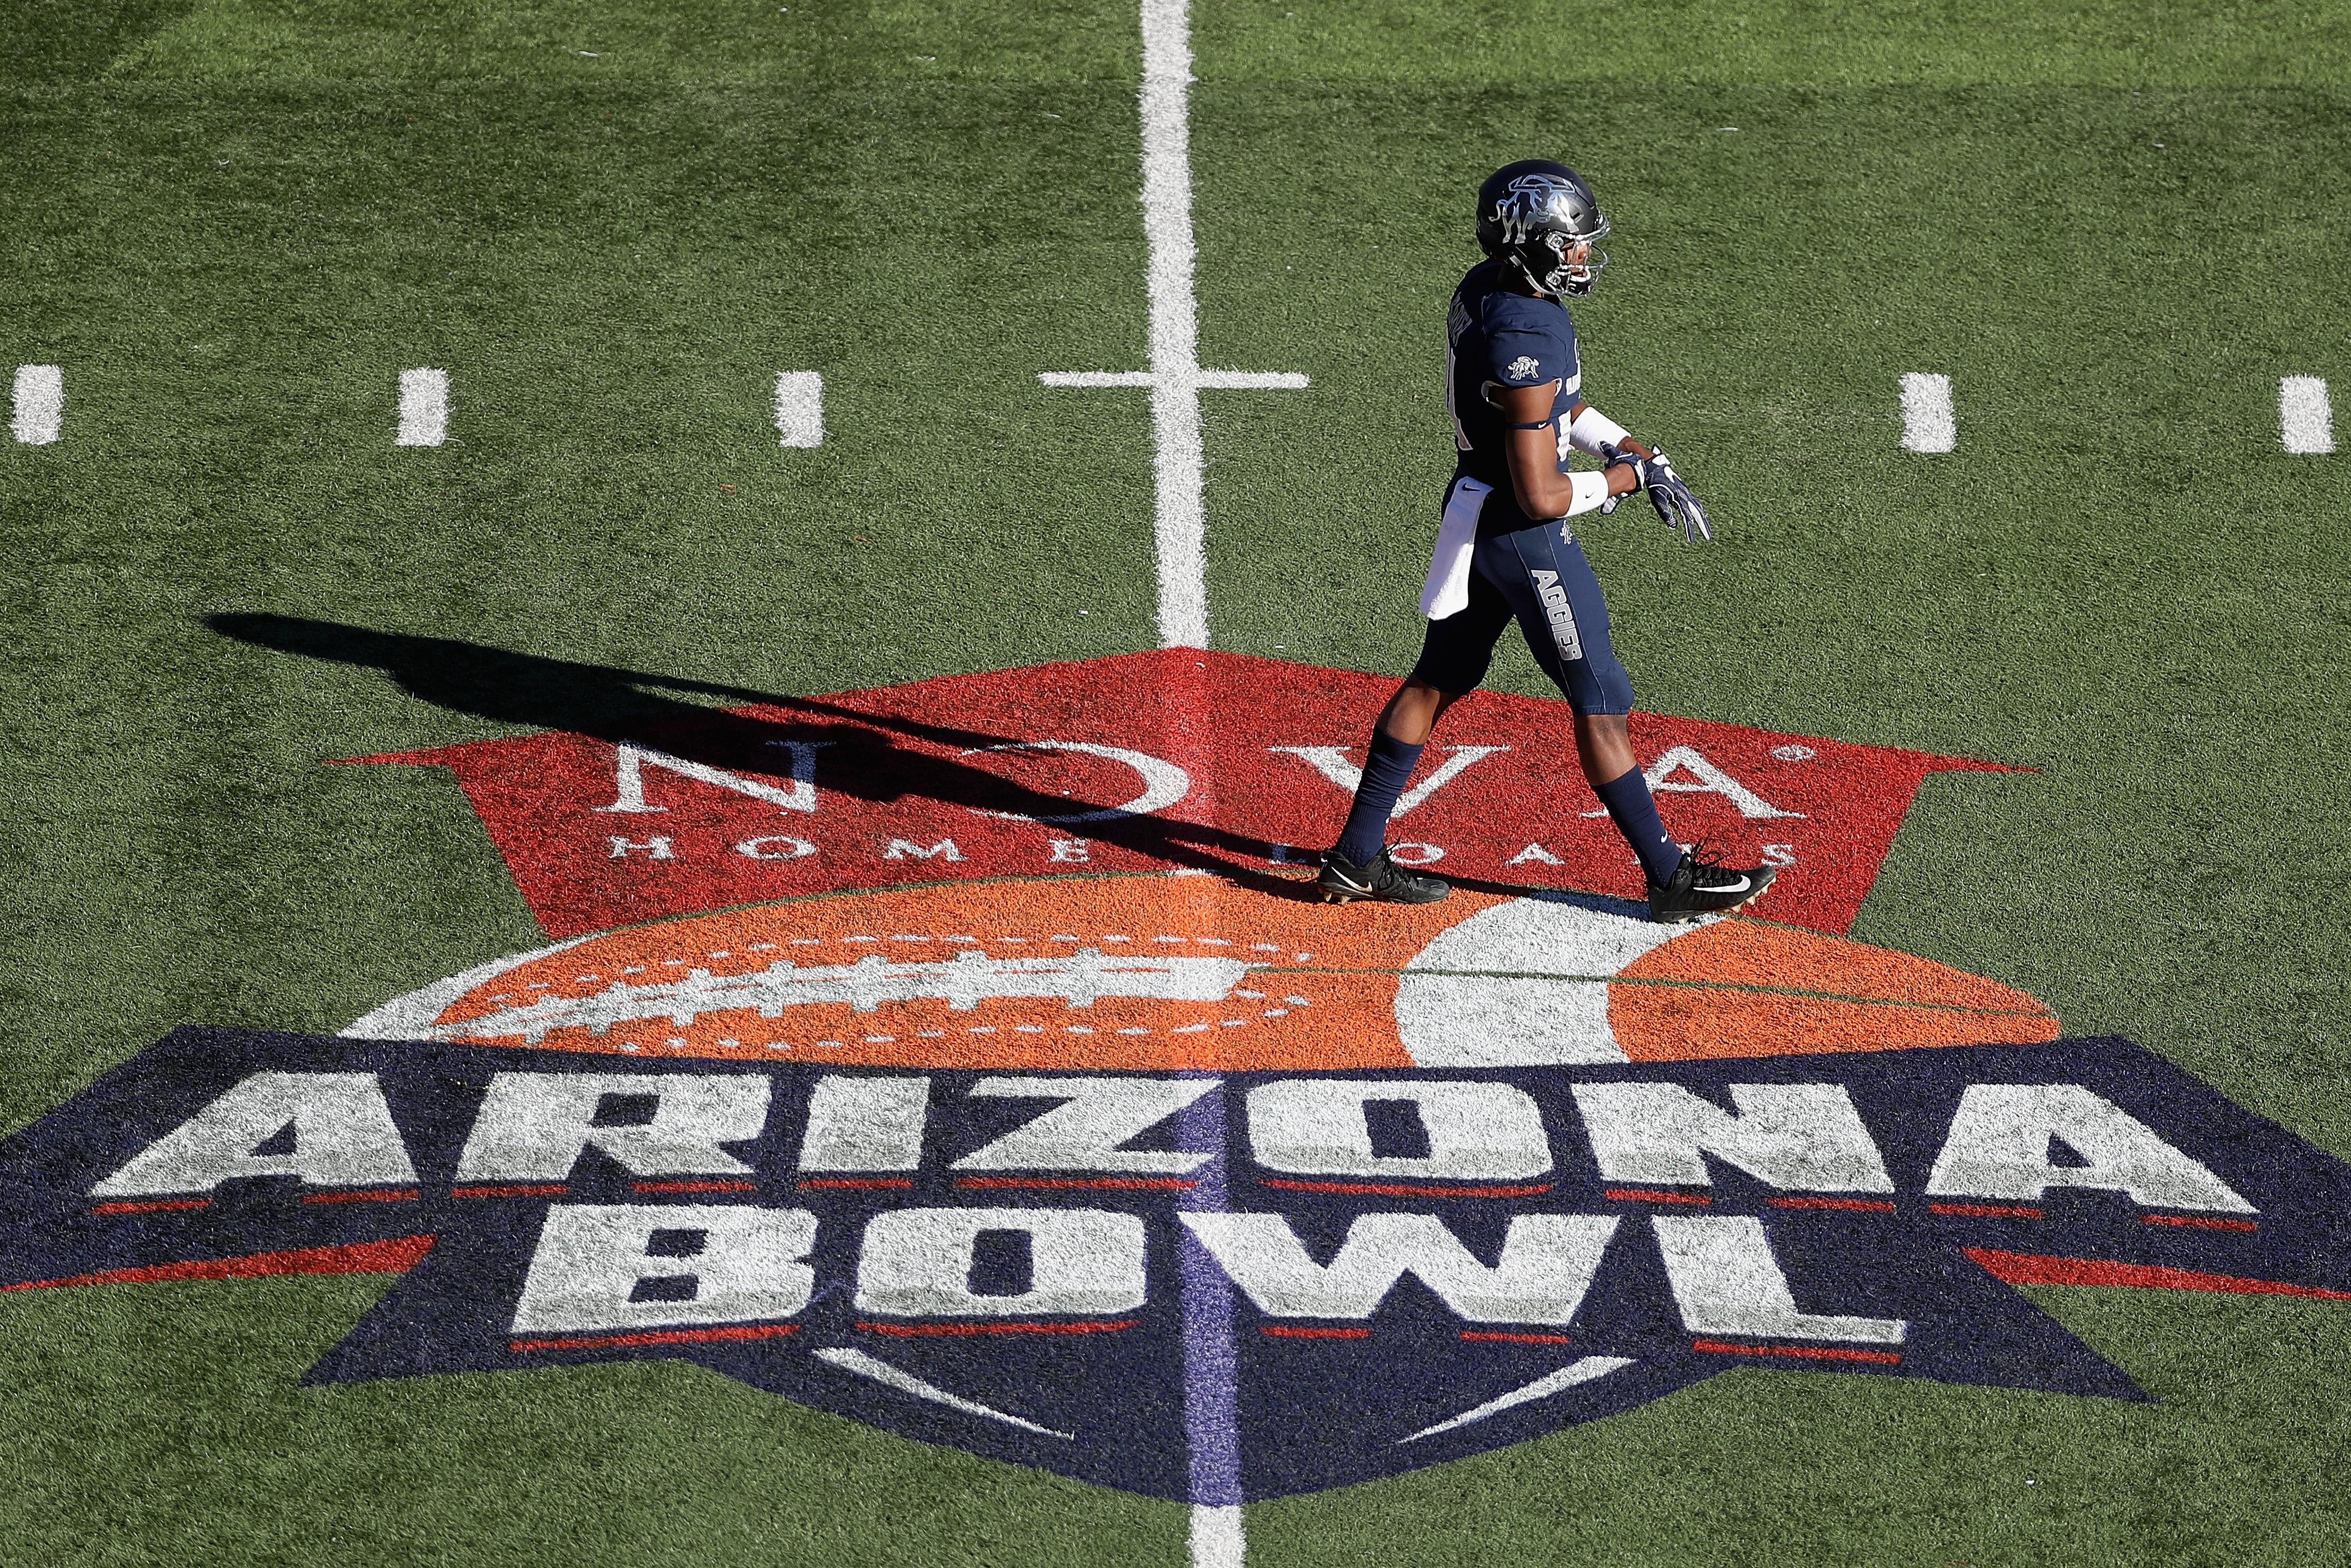 Nova Home Loans Arizona Bowl - Utah State v New Mexico State